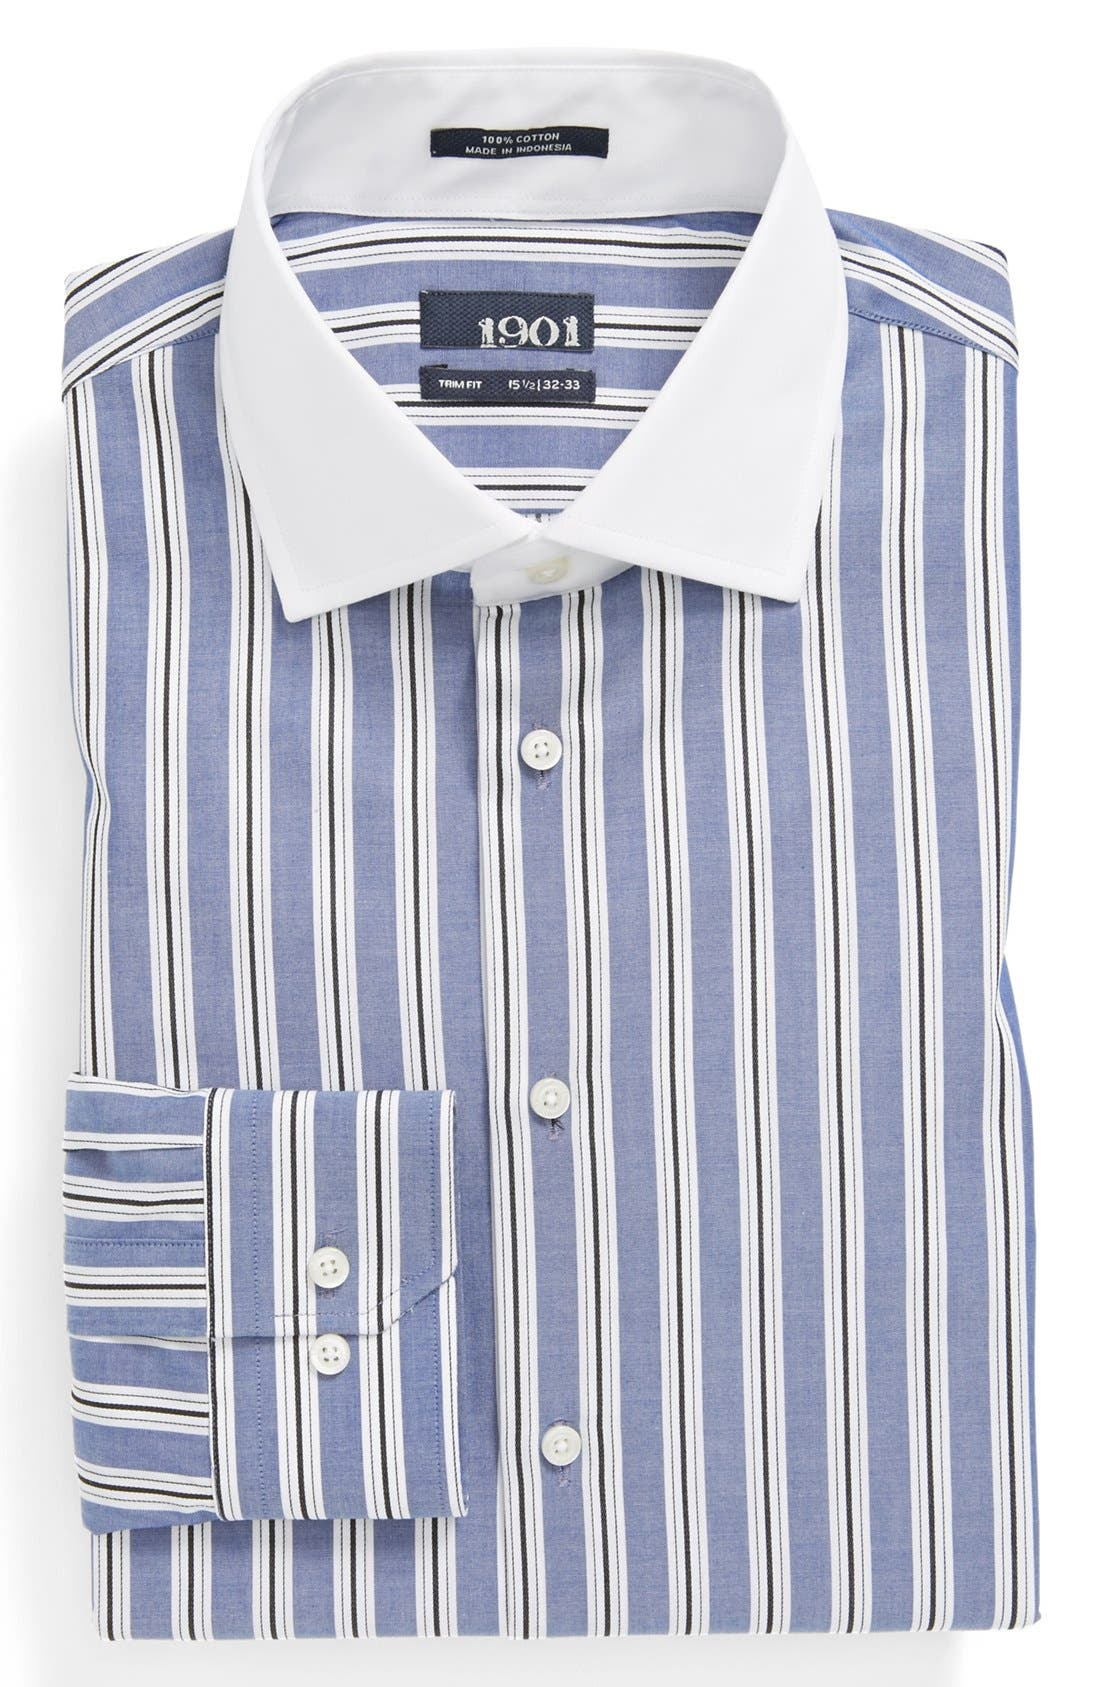 Main Image - 1901 Trim Fit Stripe Dress Shirt